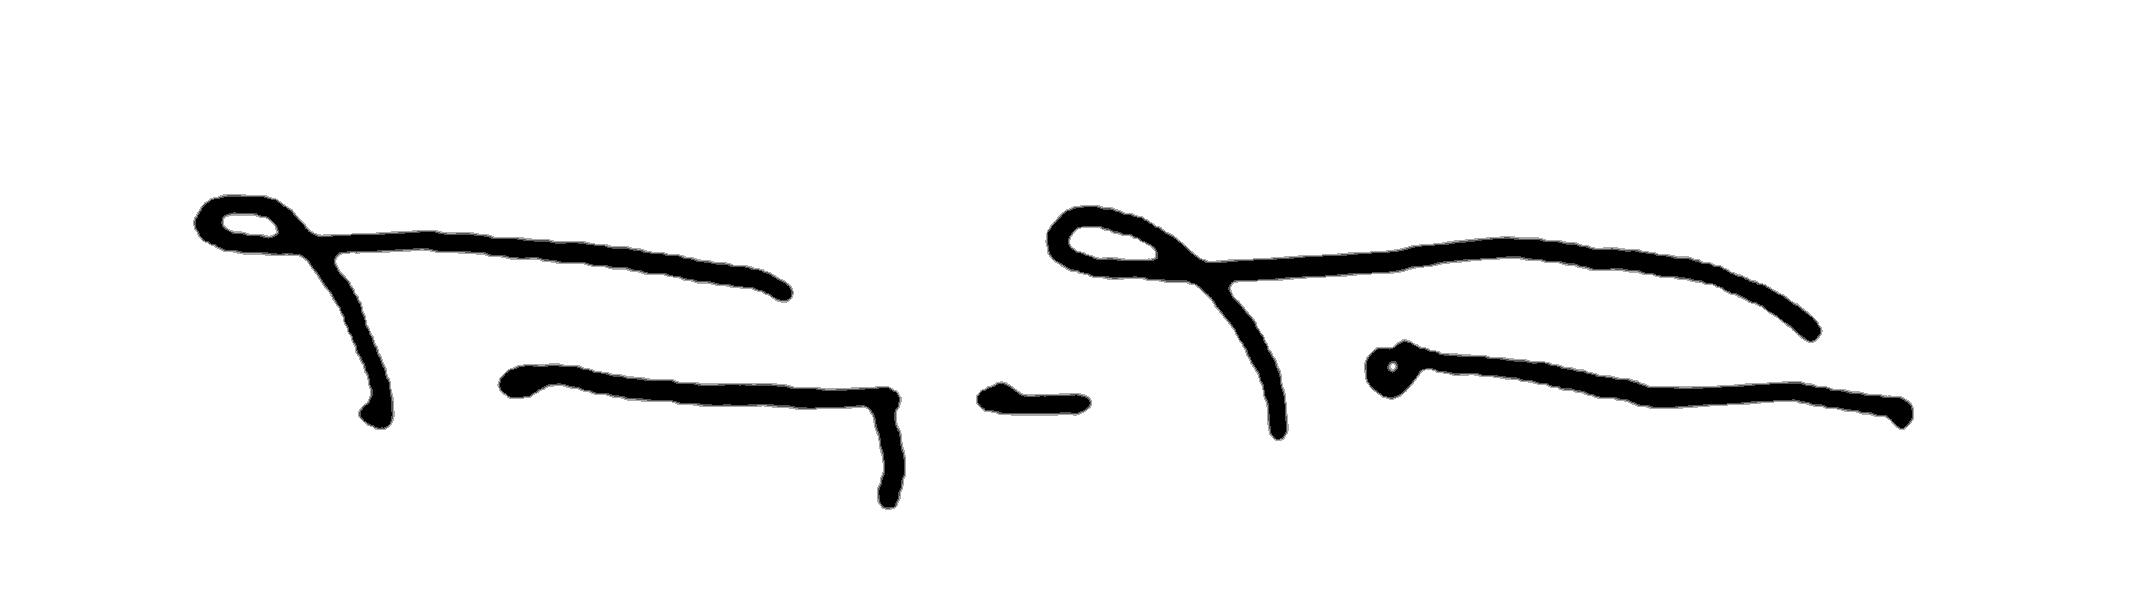 Tanya Torres's Signature